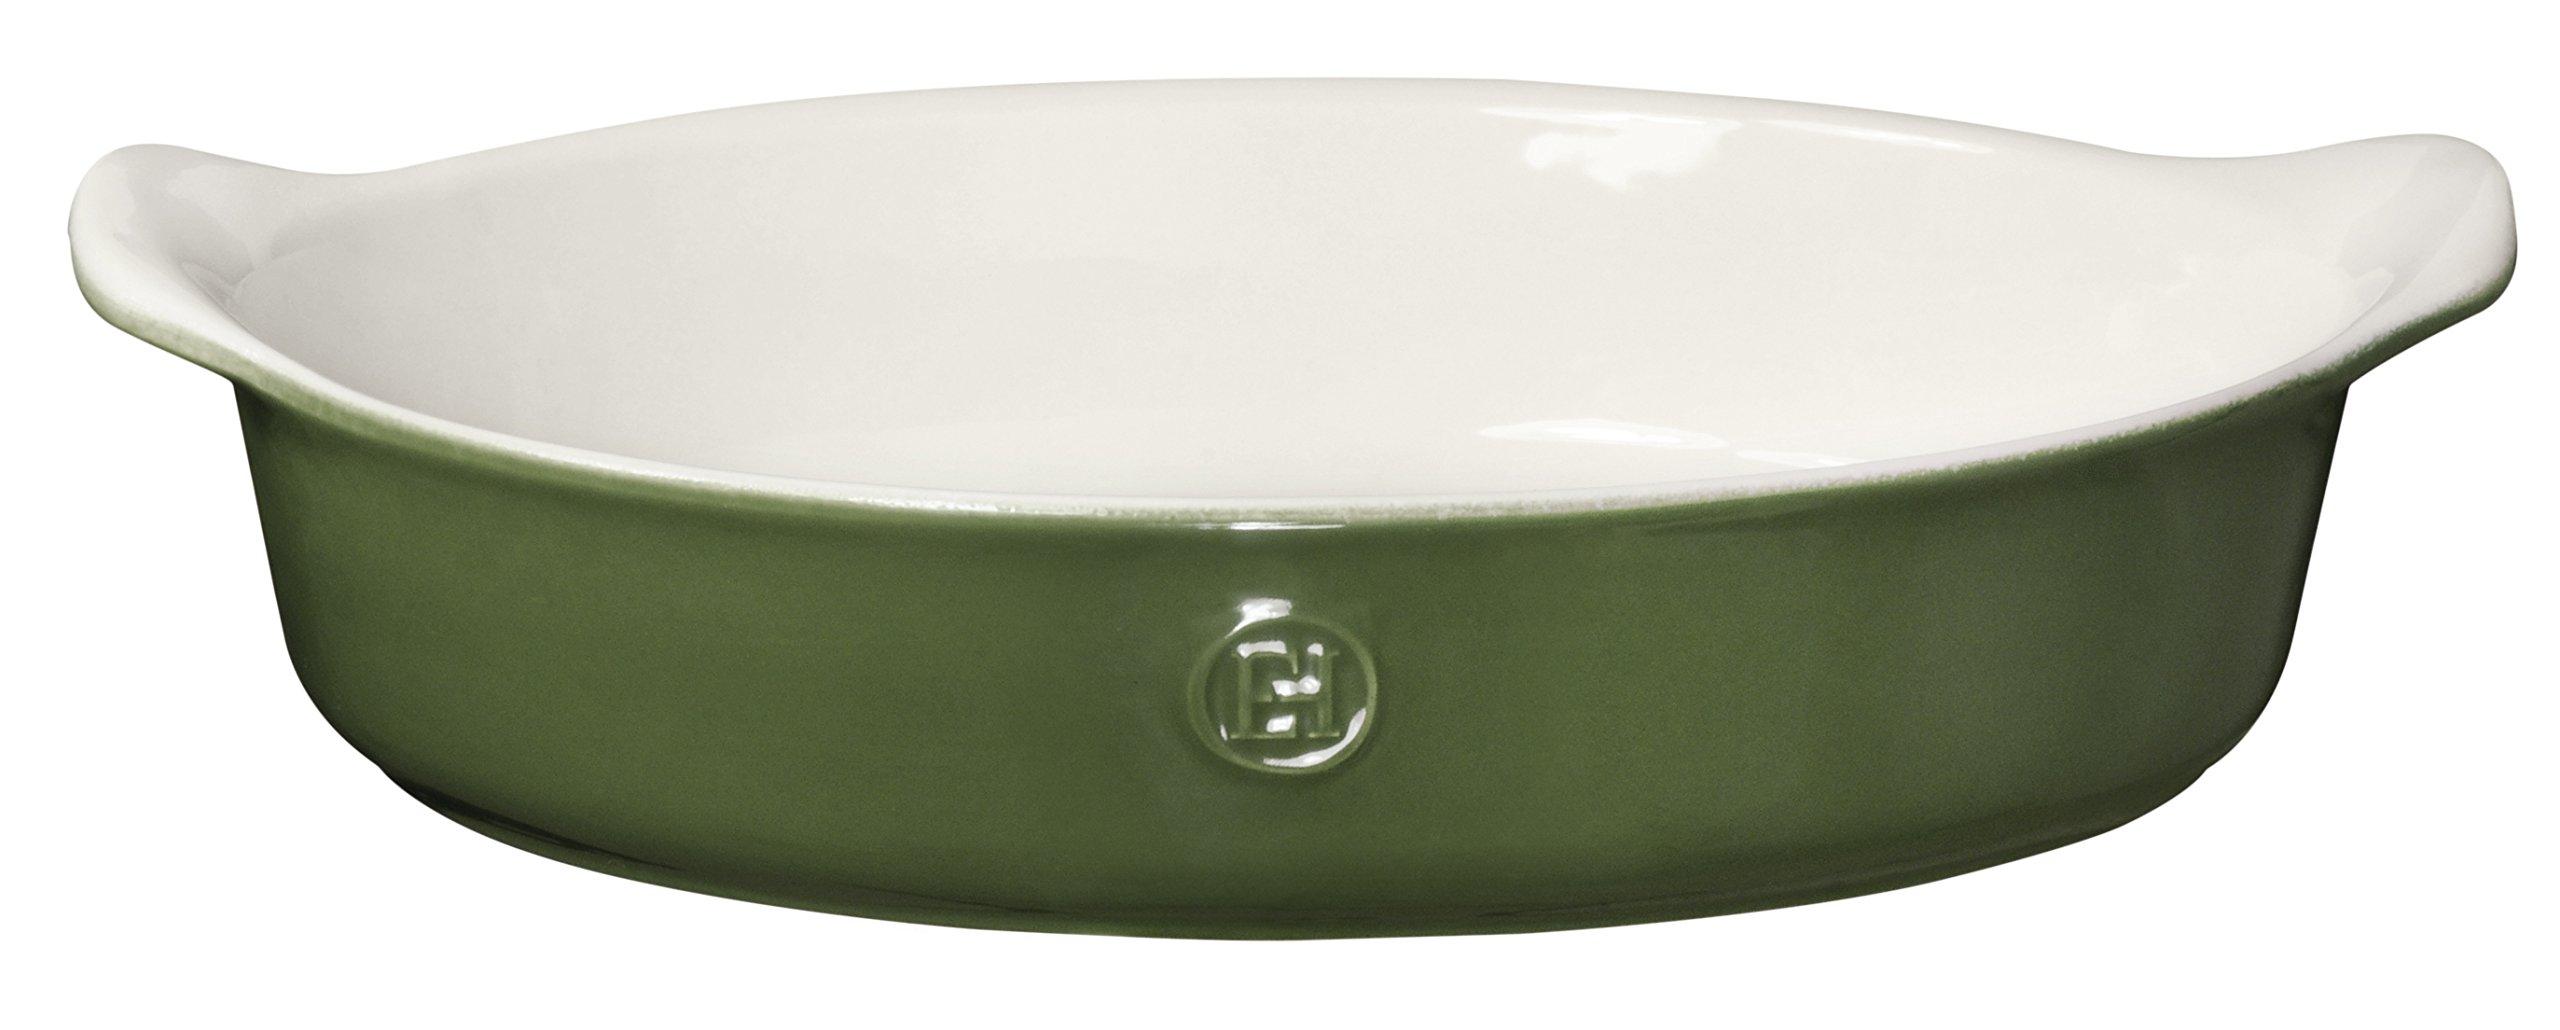 Emile Henry Made In France HR Modern Classics Oval Baker, 14.2 x 9.4'', Green